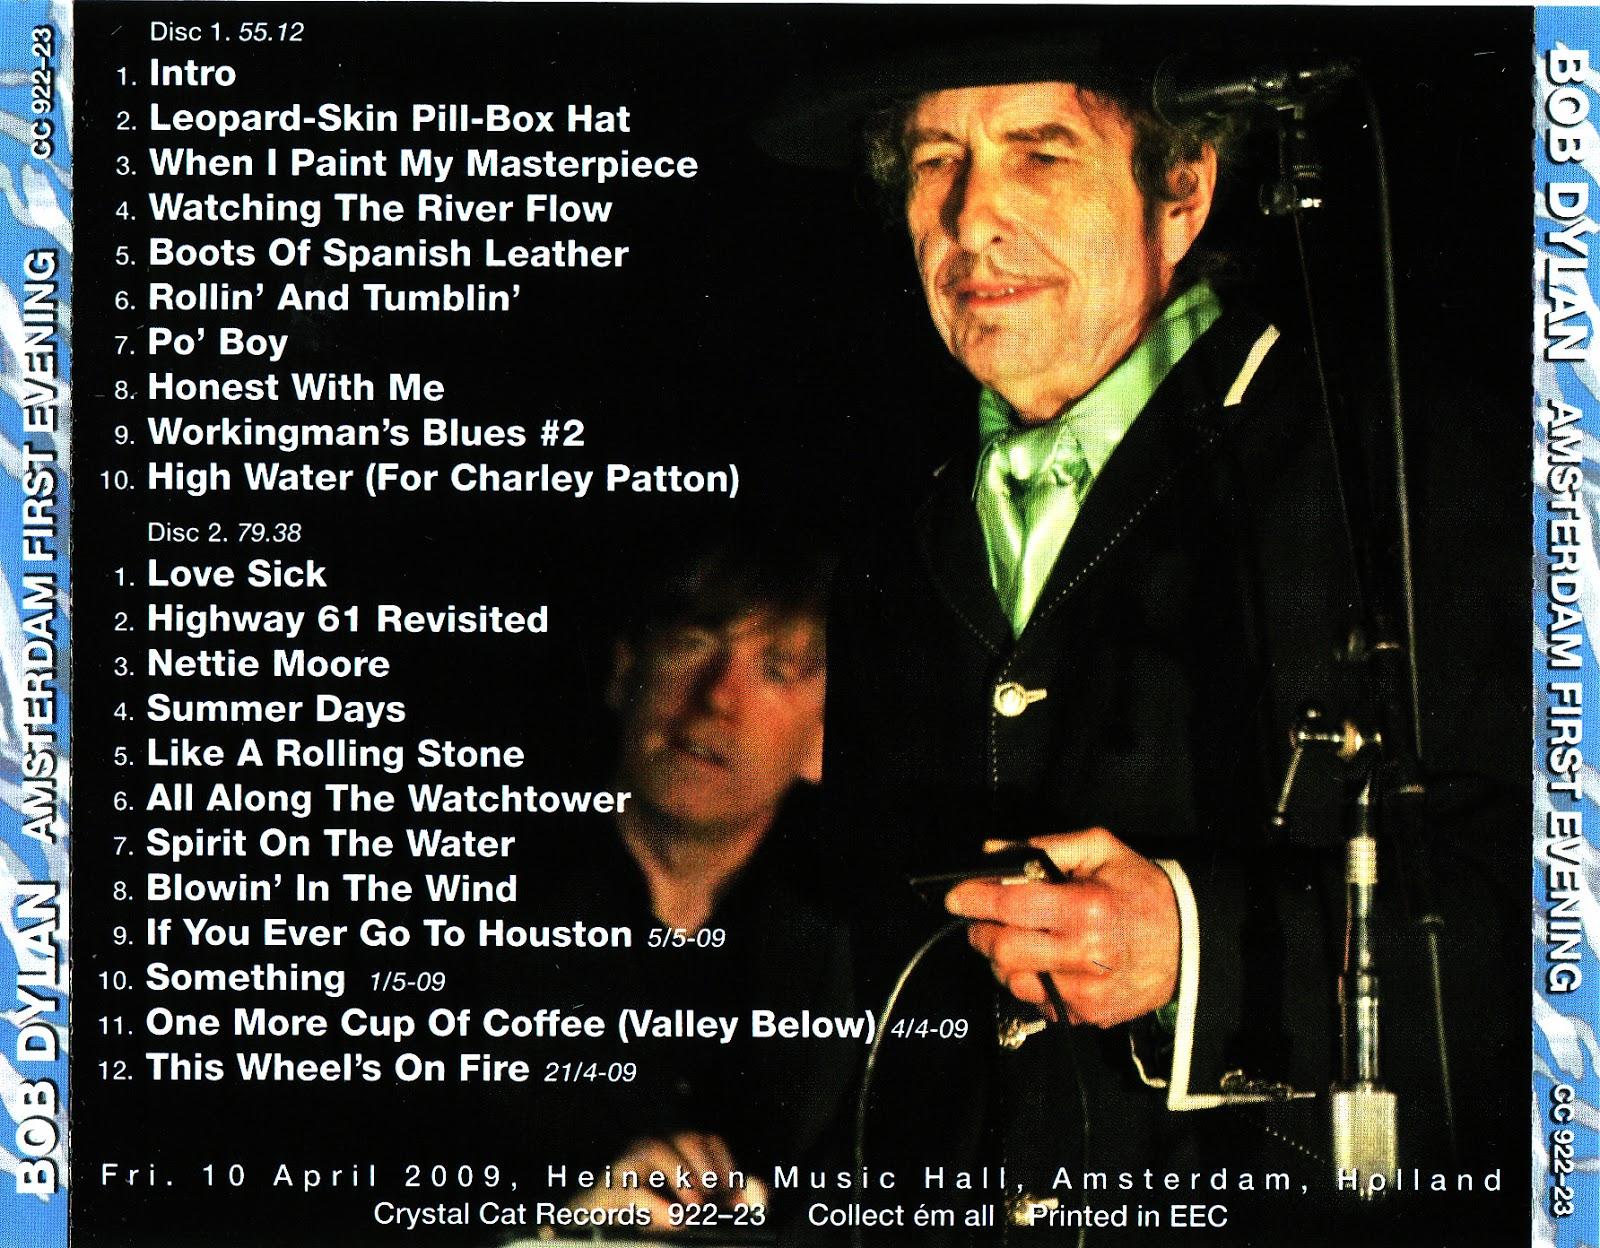 world of bootlegs bootleg bob dylan heineken music hall amsterdam 10 april 2009 cd covers. Black Bedroom Furniture Sets. Home Design Ideas